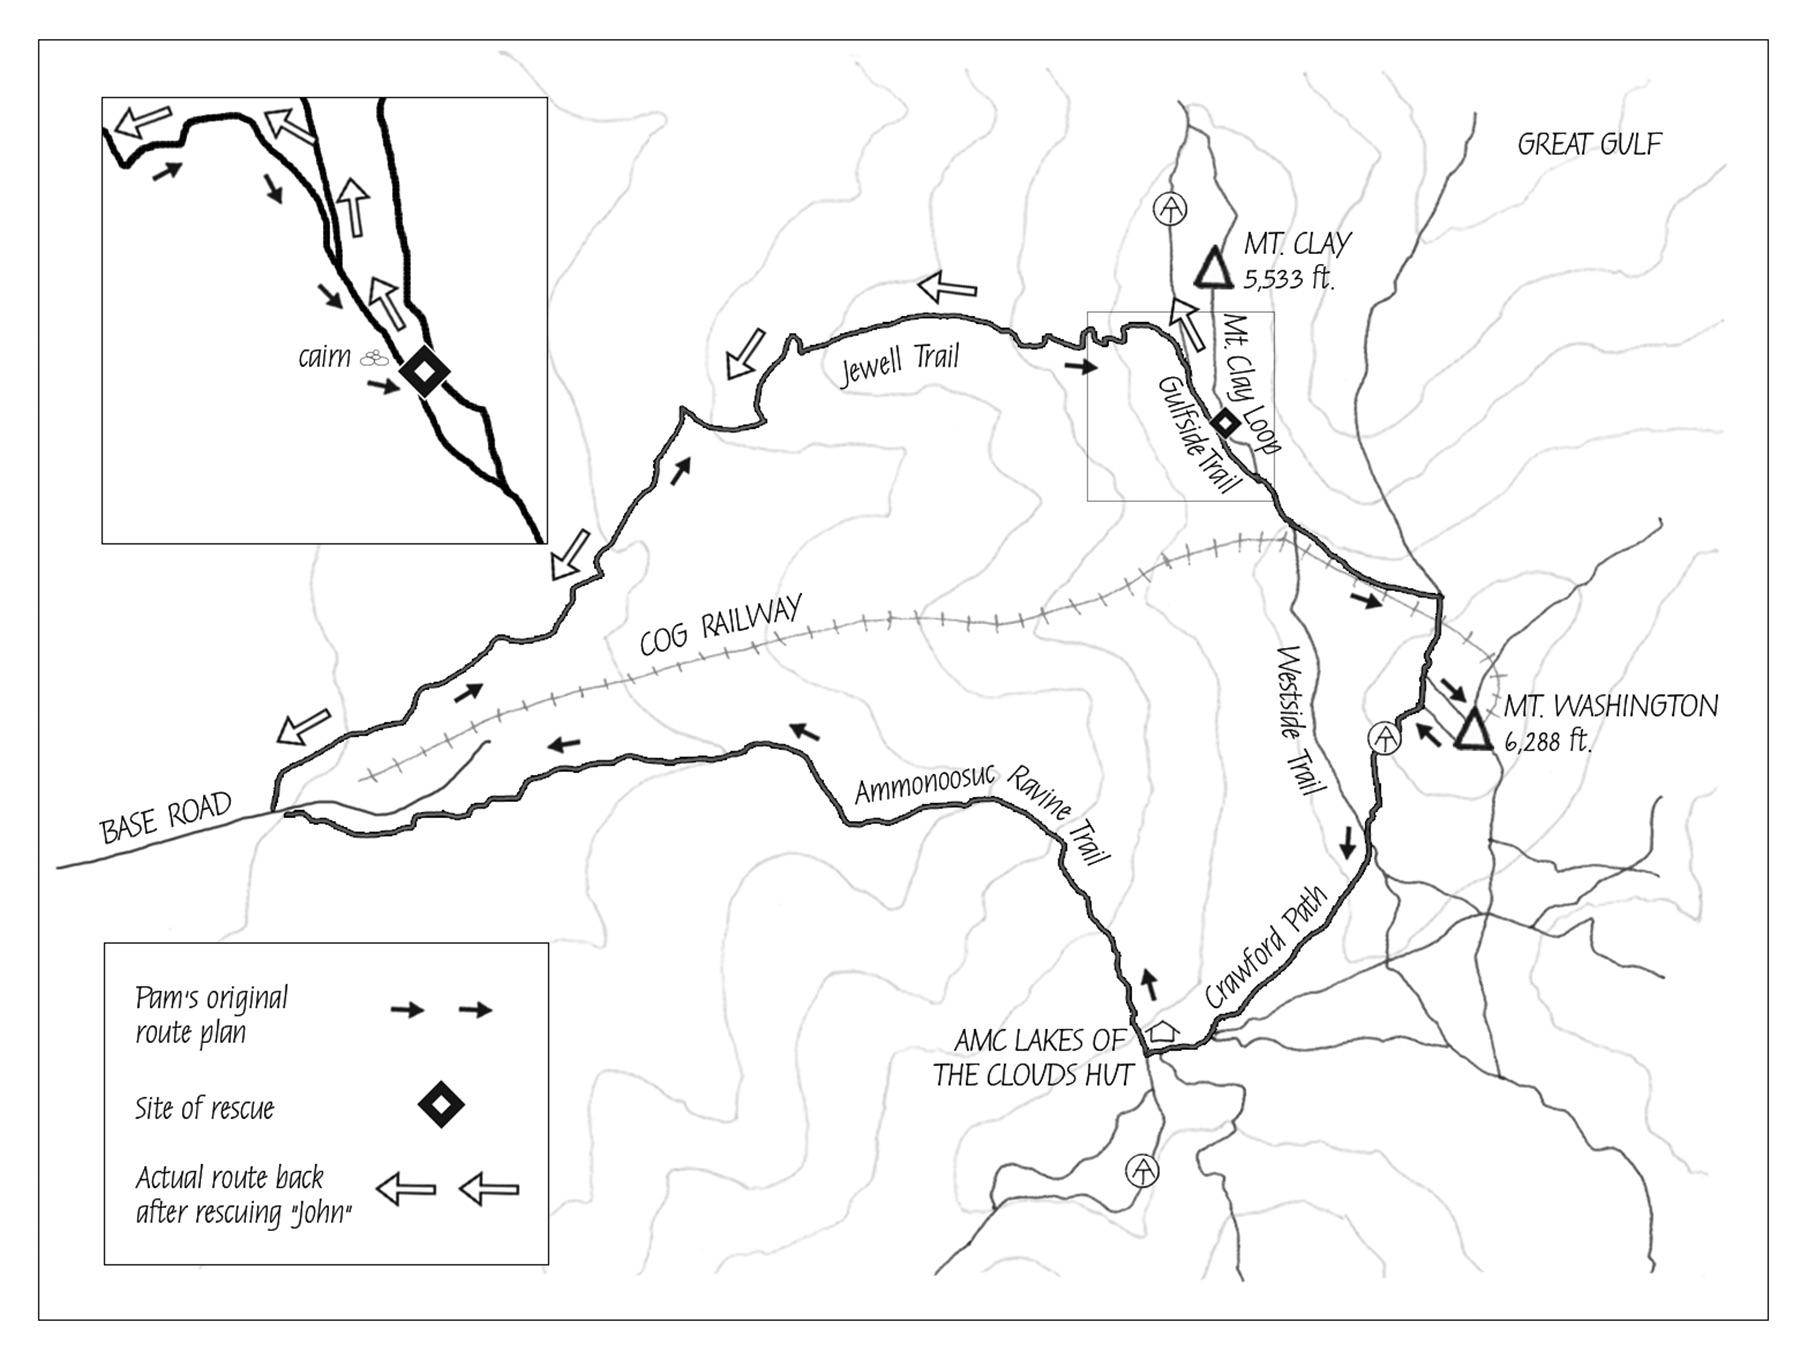 Jewell Trail Mt Washington Map.Emotional Rescue Appalachian Mountain Club